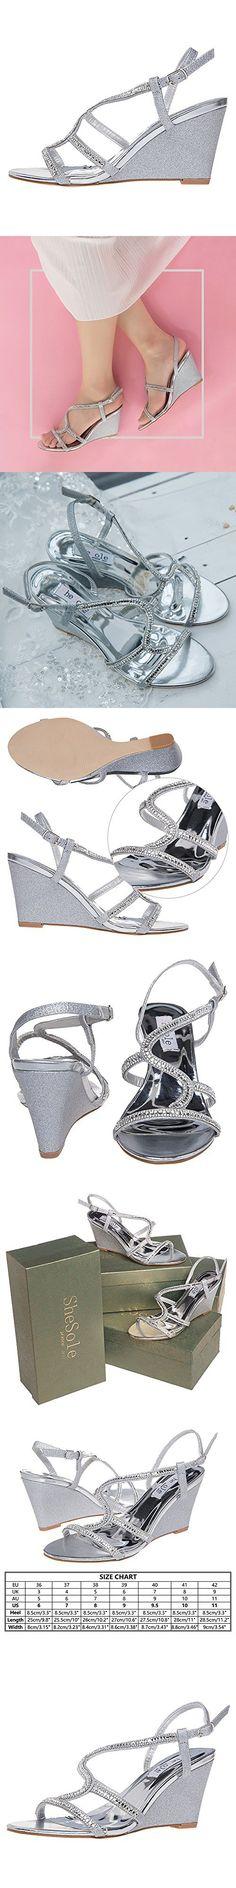 SheSole Women's Wedge Sandal Wedding Shoes Silver Size 10